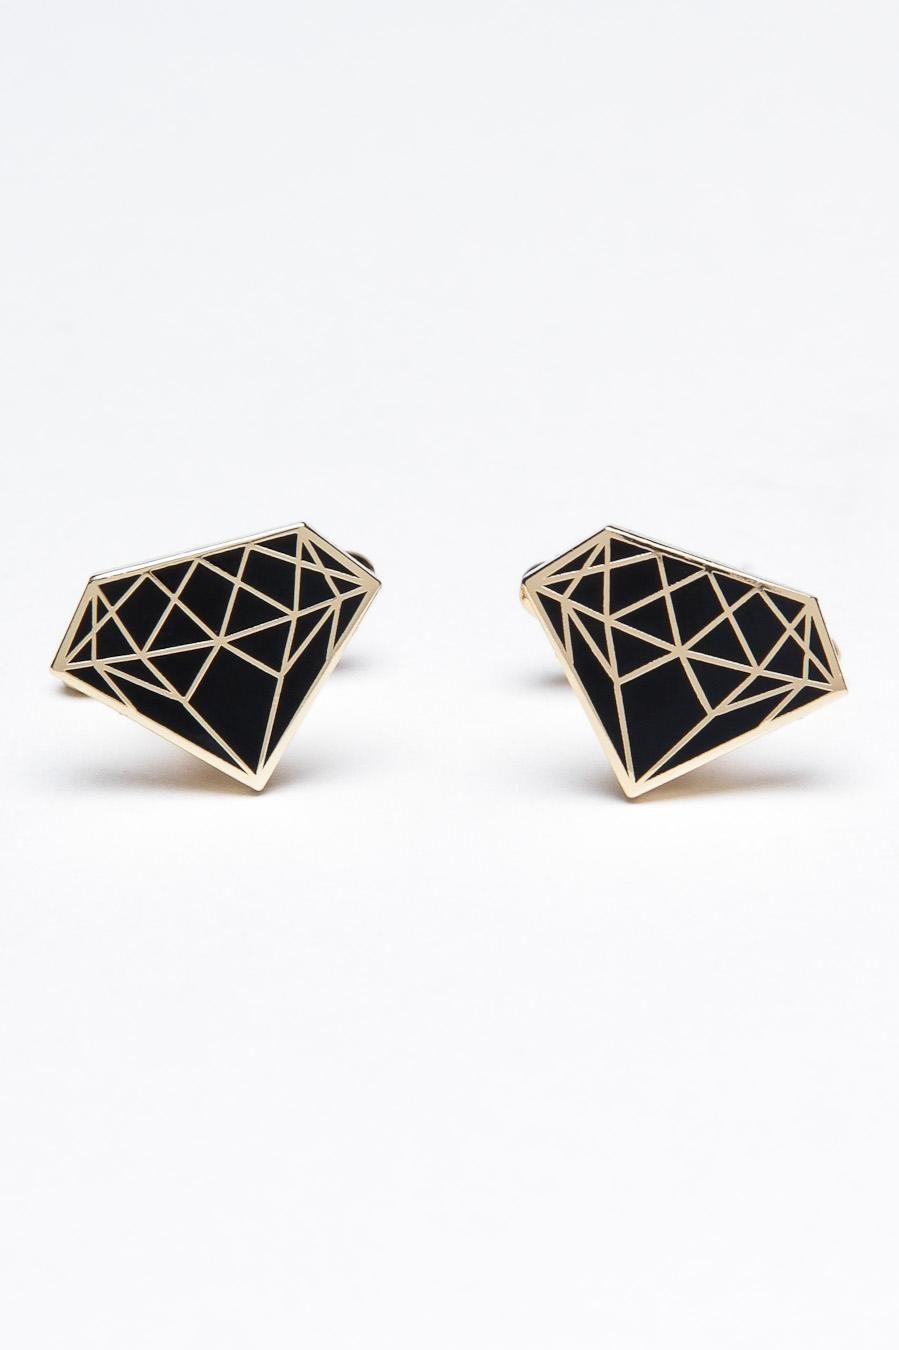 Carat Cufflinks Geometric Design Black Gold Diamond For Him